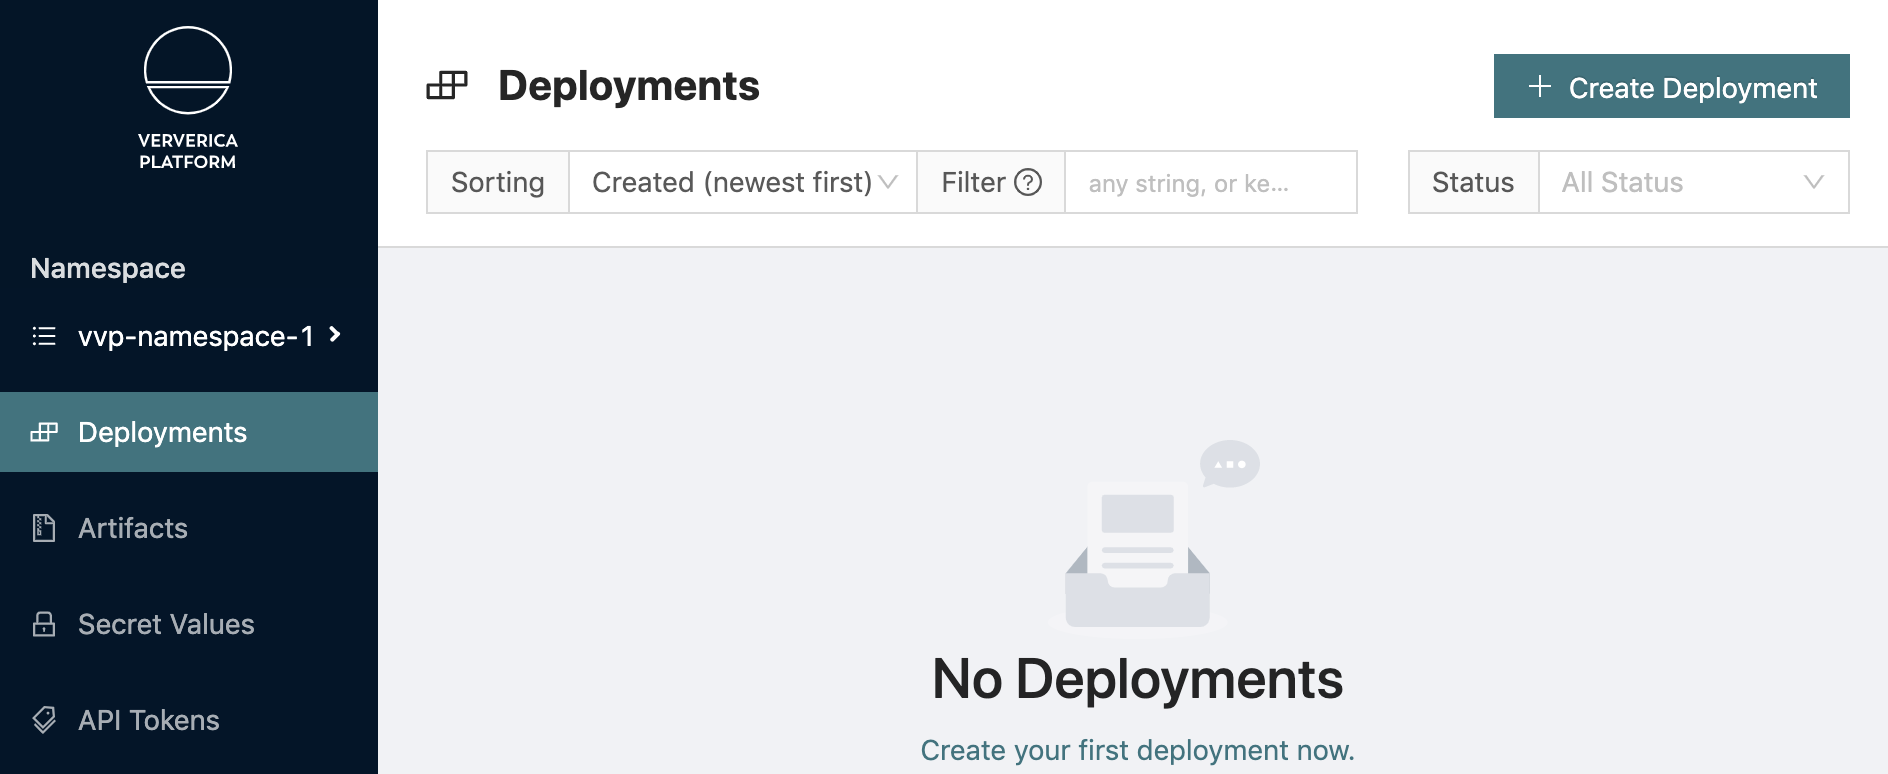 Ververica Platform, Namespaces, Kubernetes, Openshift